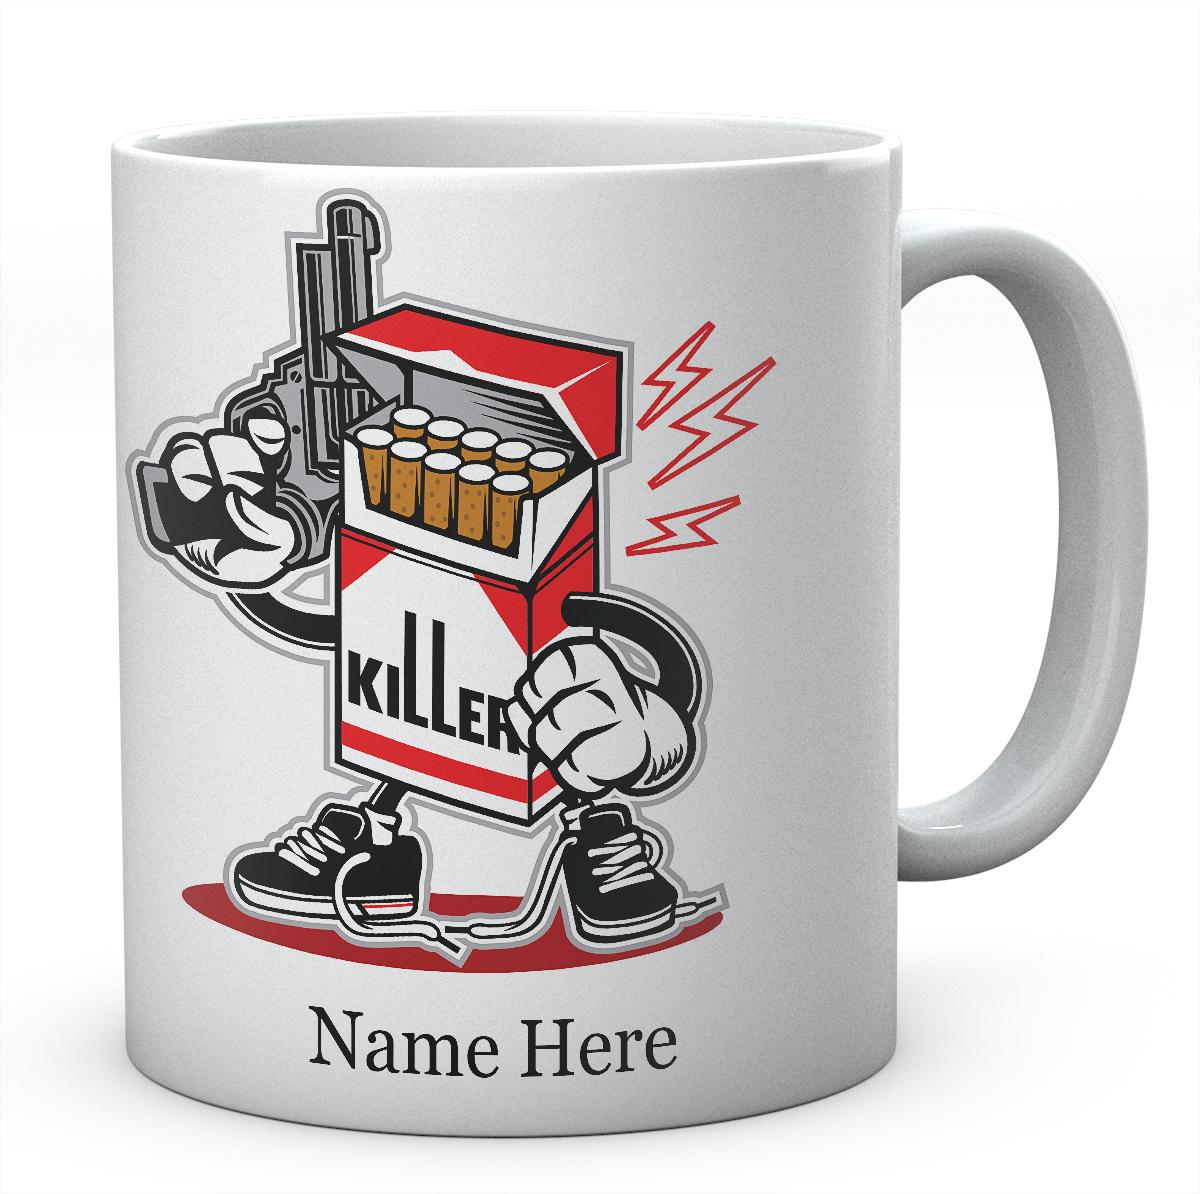 Cigarette Killer Funny Mug